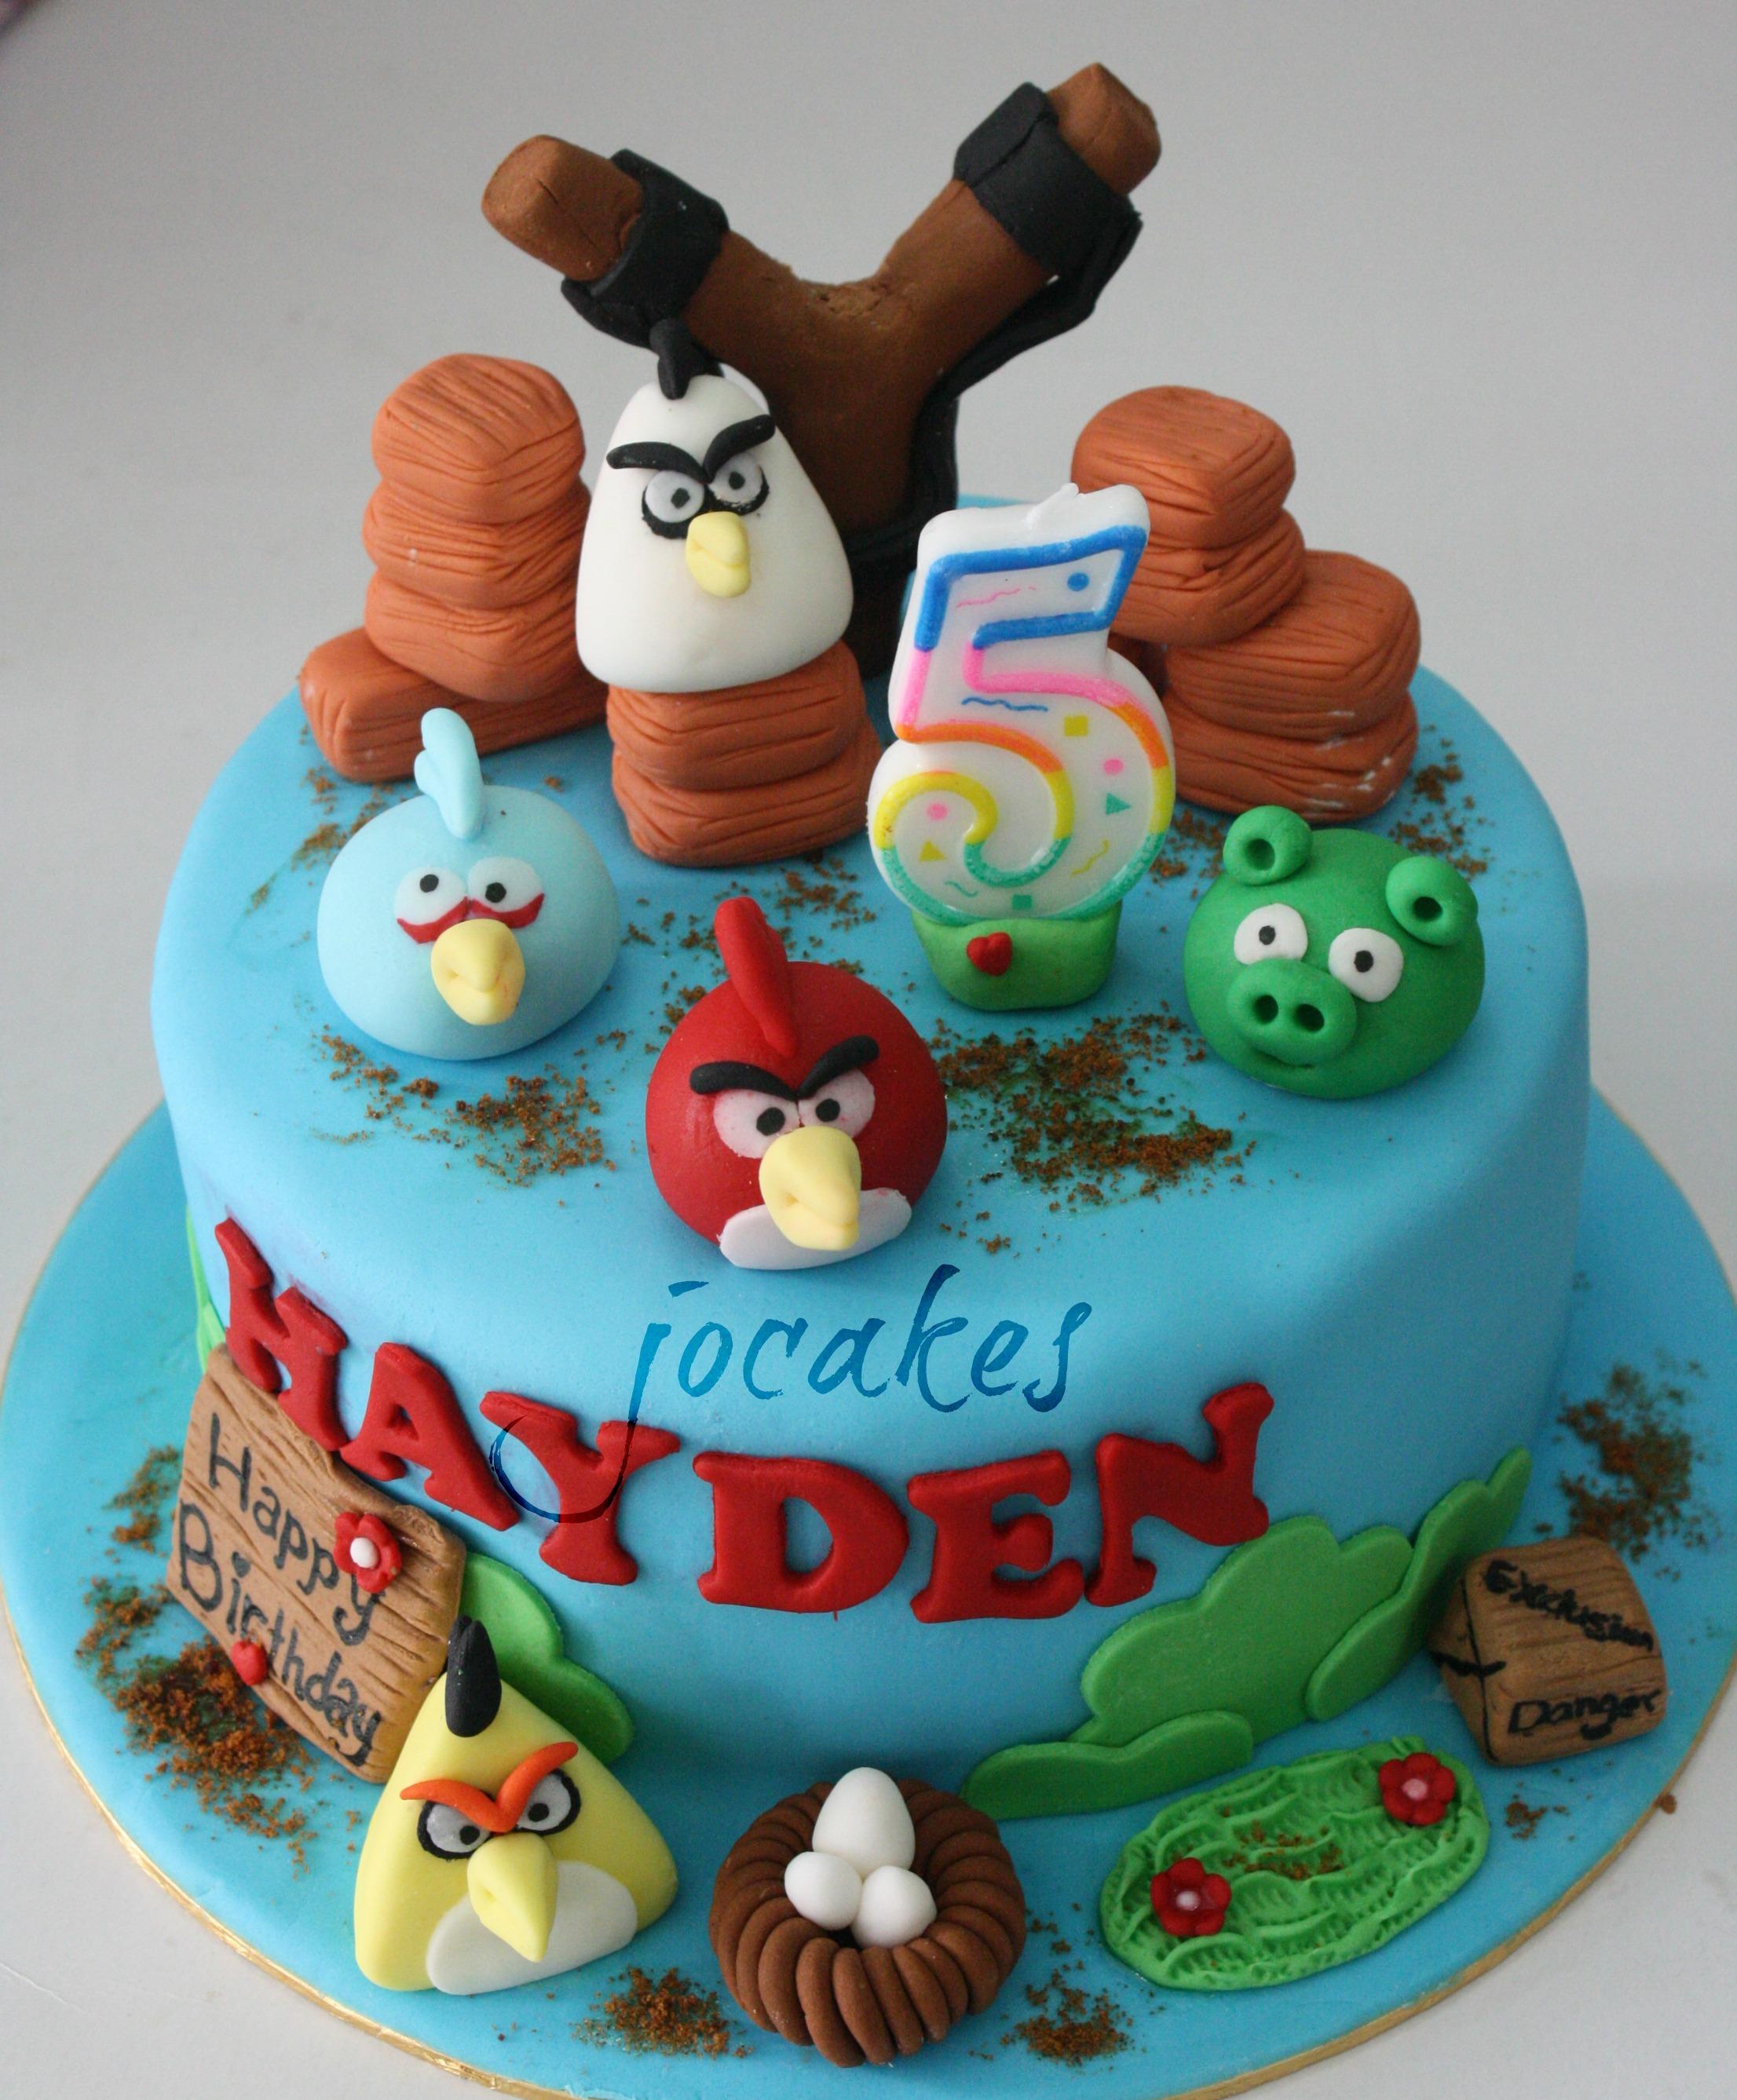 5 Year Old Birthday Cakes